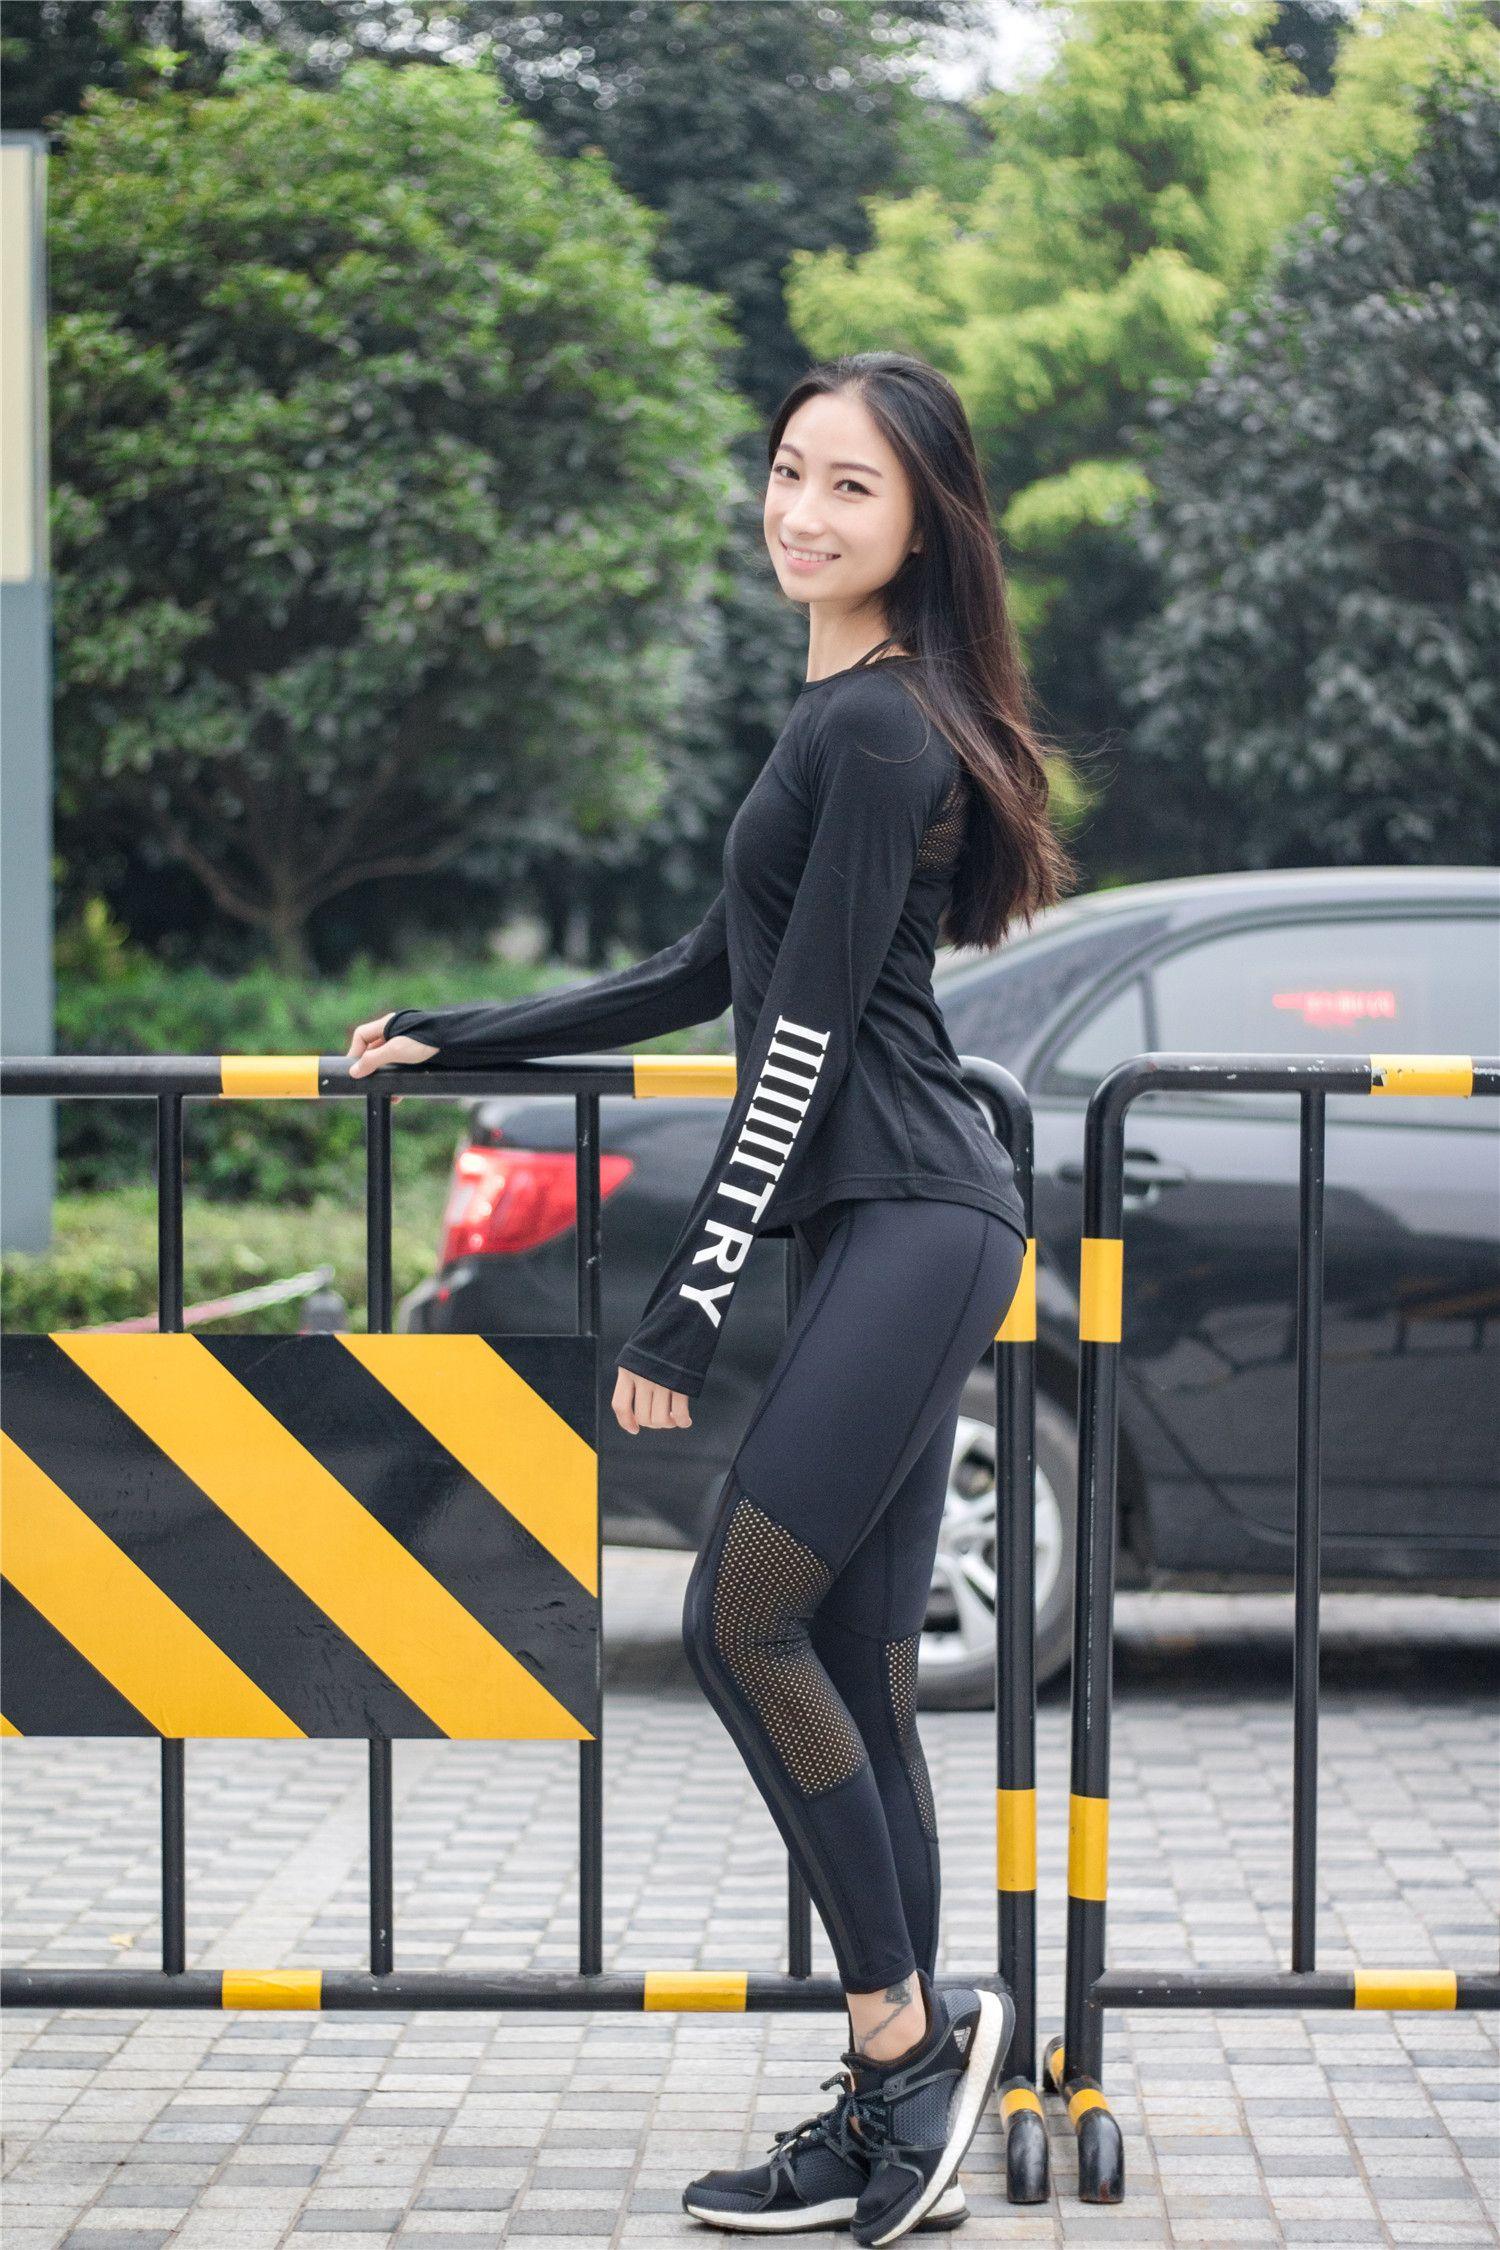 b1b8d15816 2019 High Quality Fitness Gym Leggings Pants High Waist Women Sports ...